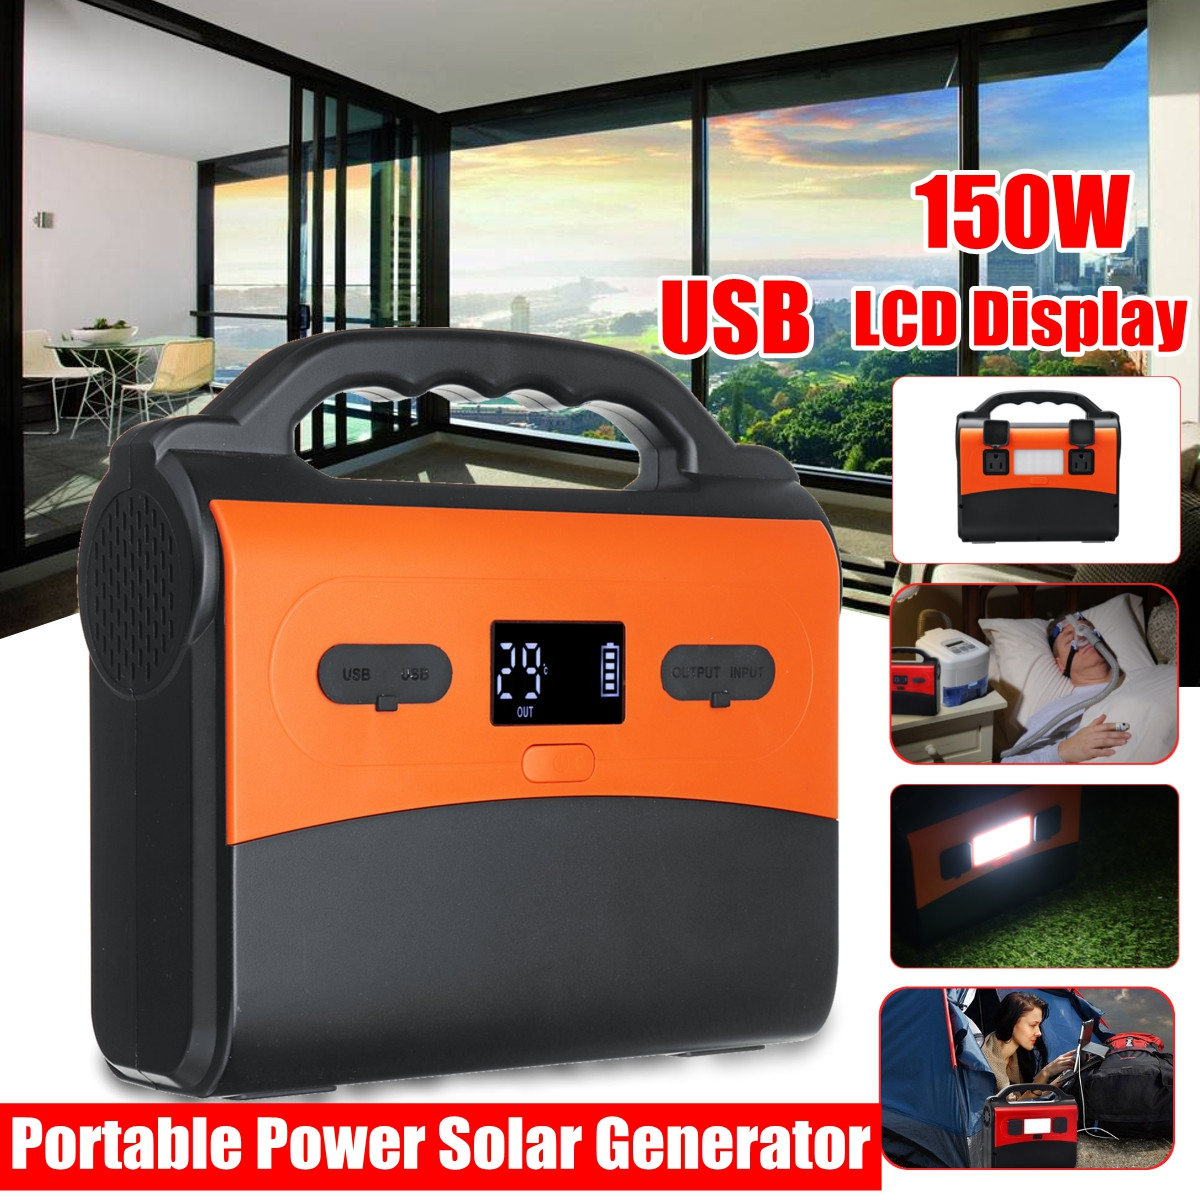 цена на 150Wh 150W Portable Solar Generator Power Supply Energy Storage Home Outdoor Power Generation USB LCD Display